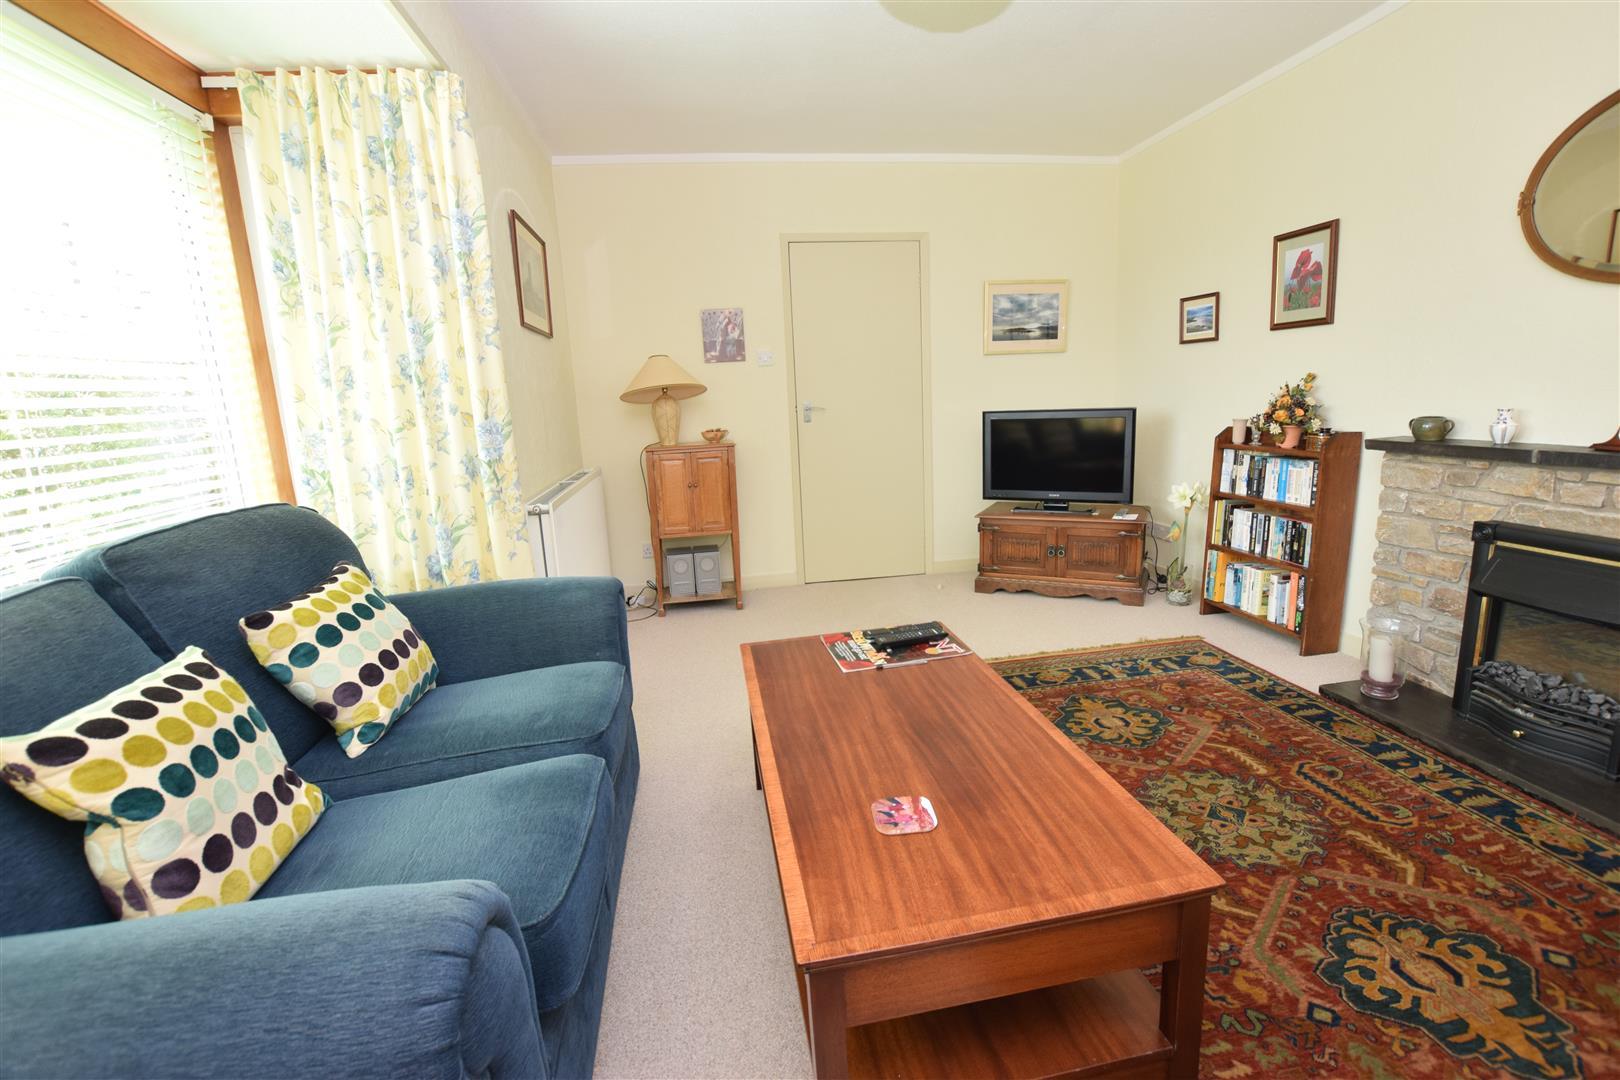 Elmbank, 7, Irvine Terrace, Pitlochry, Perthshire, PH16 5HW, UK